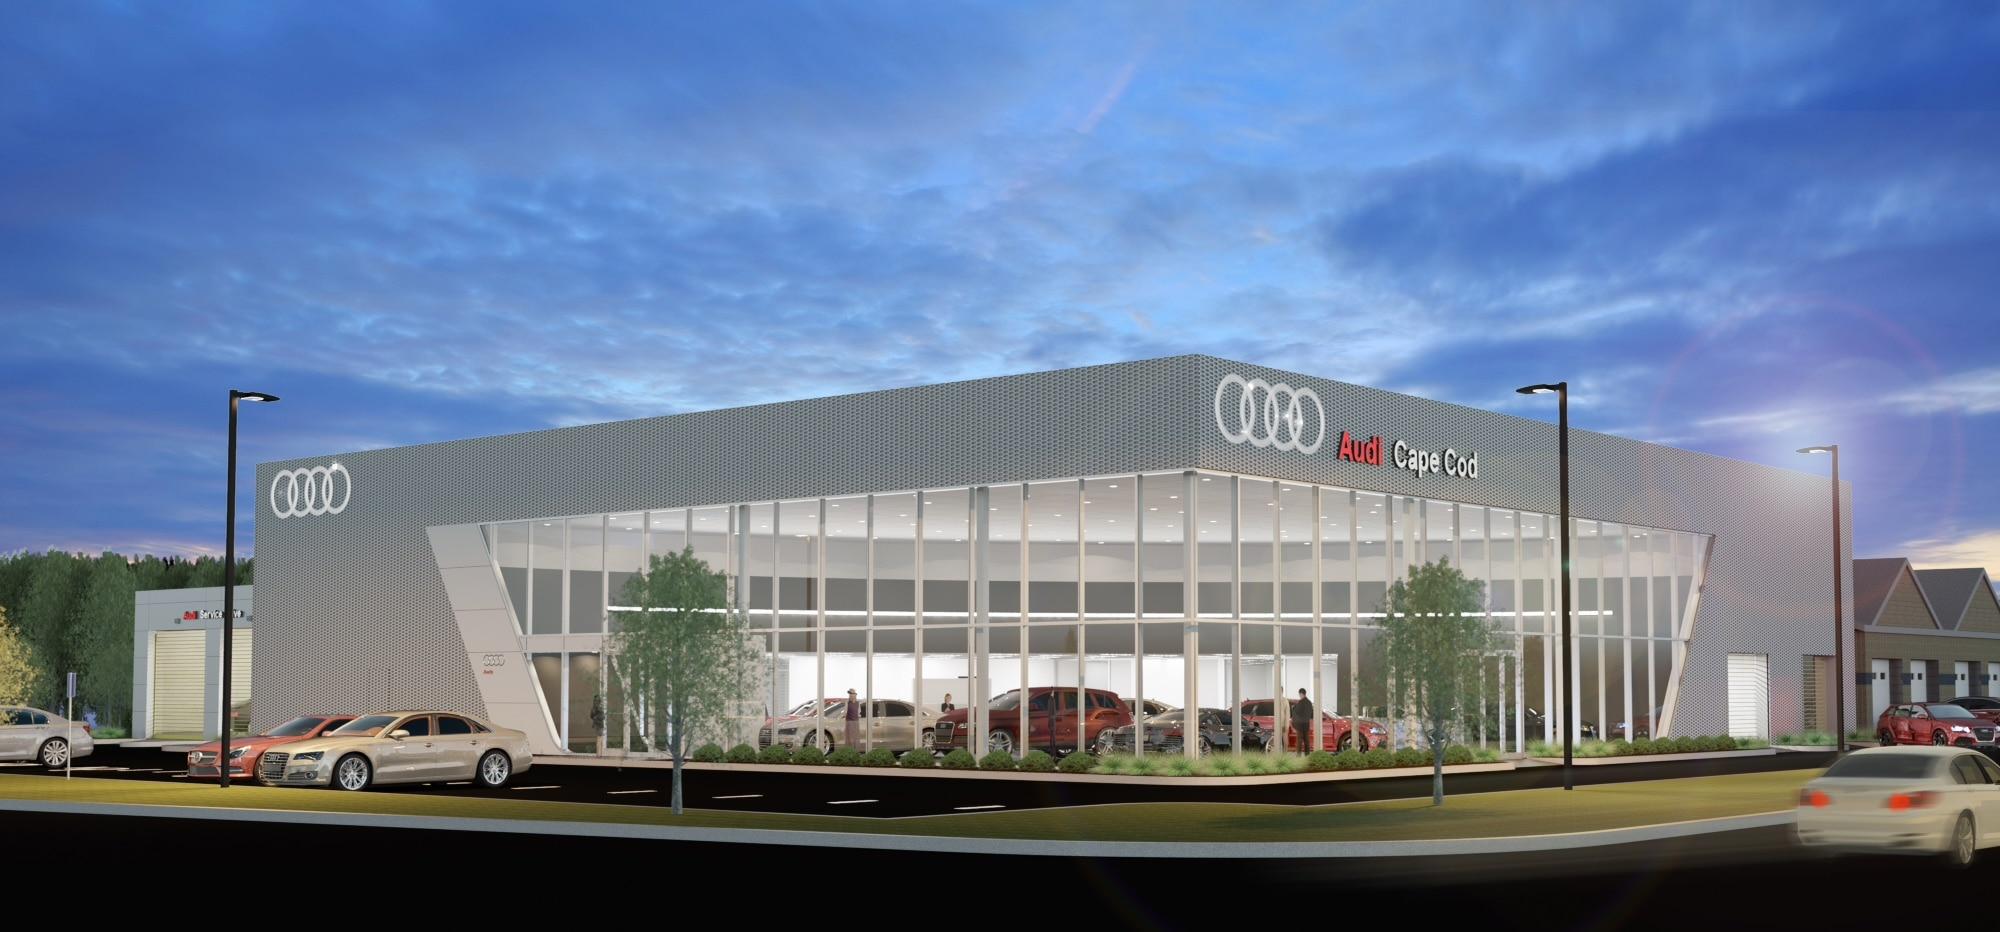 Audi Dealership Atlanta >> Dealership Photos | Audi Cape Cod Photos